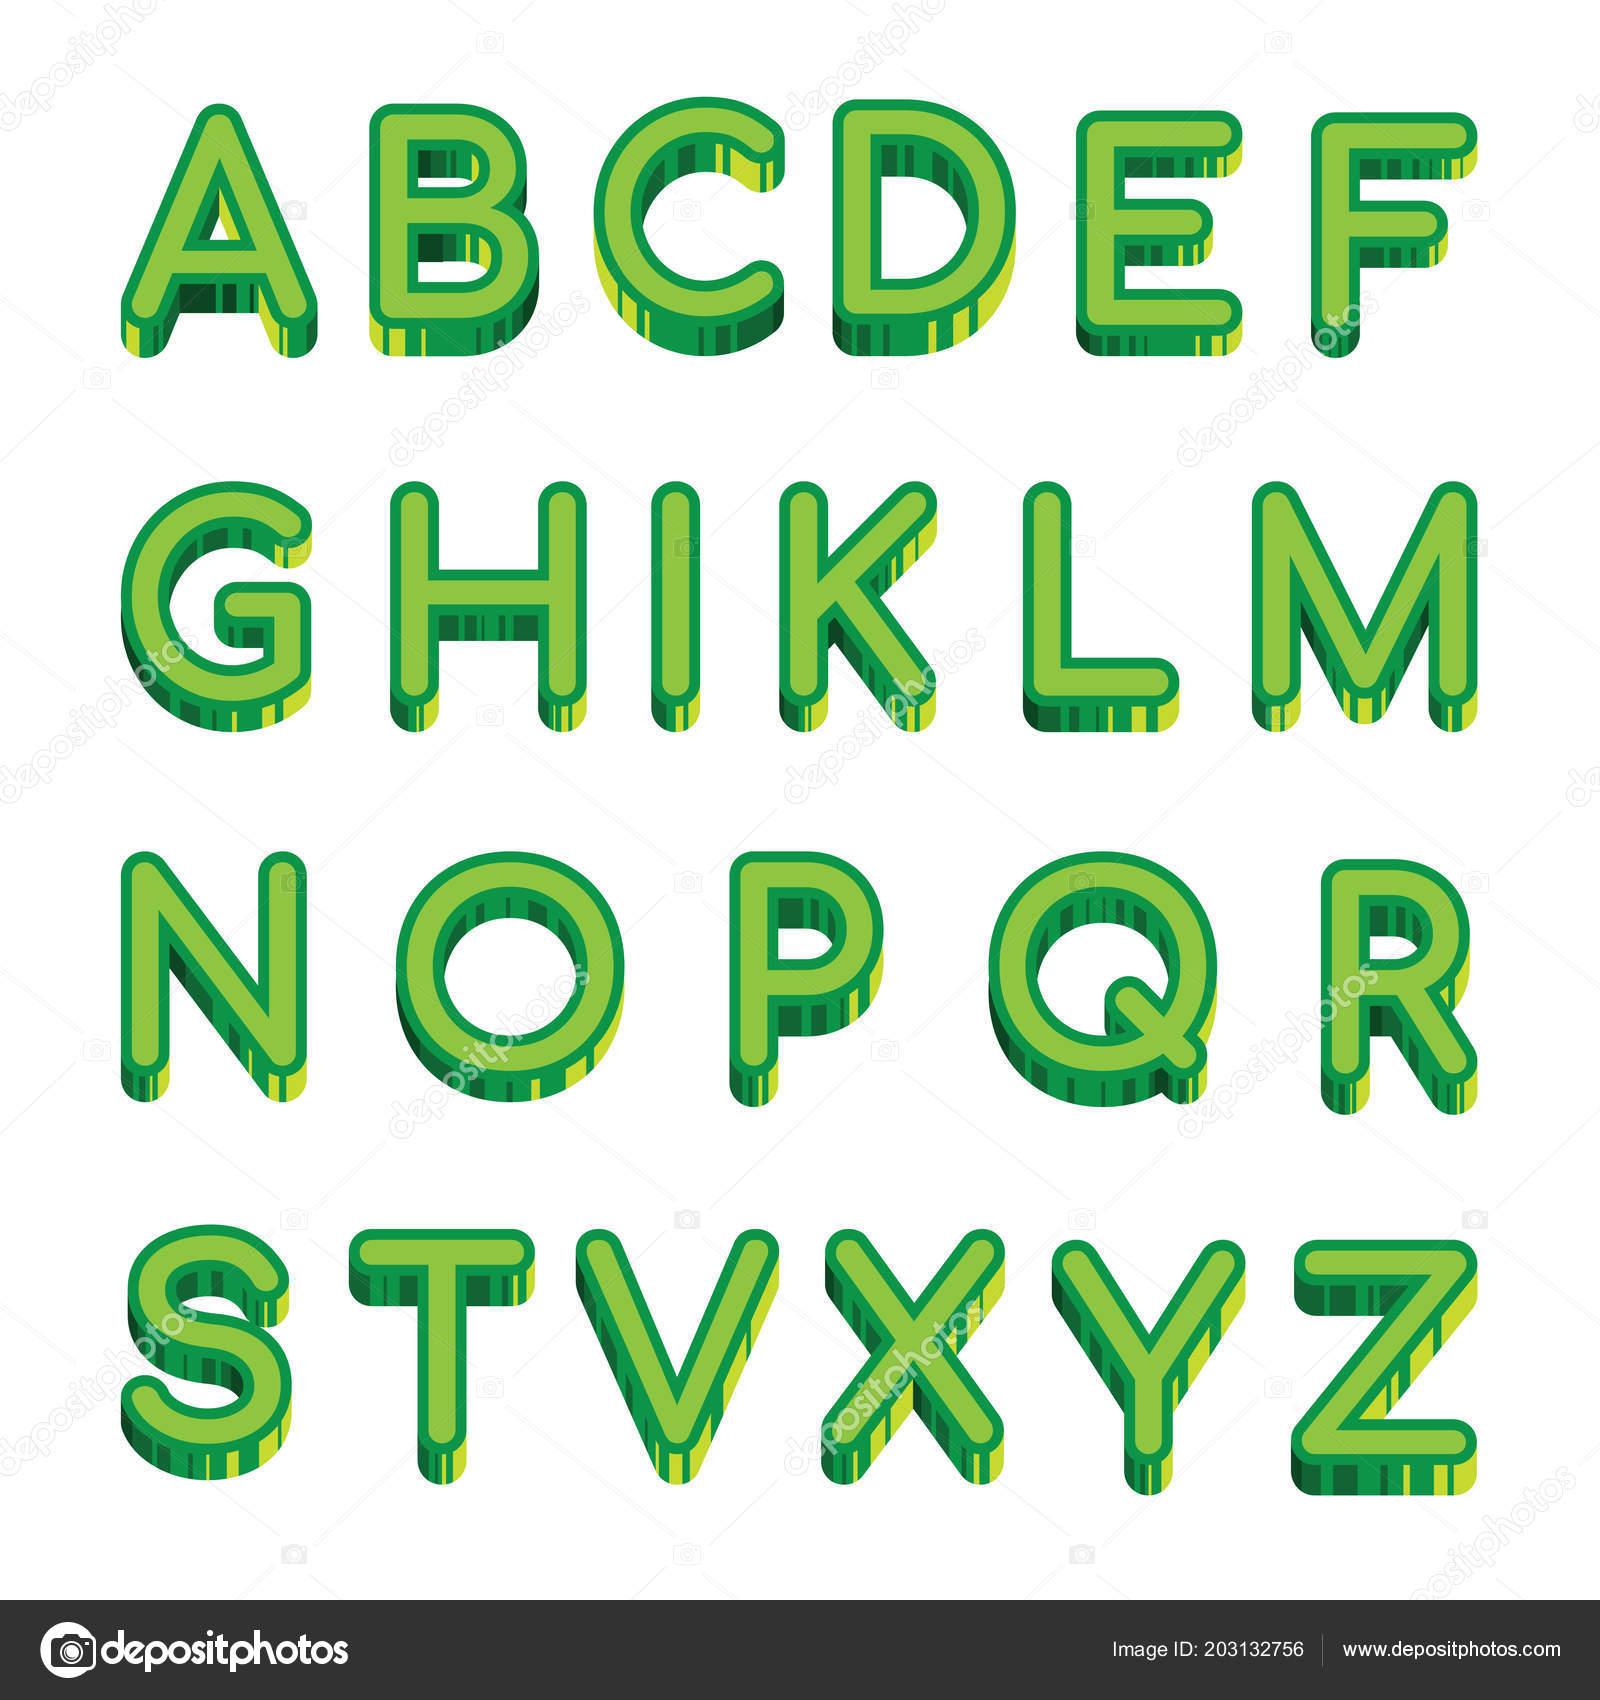 vector art green letters